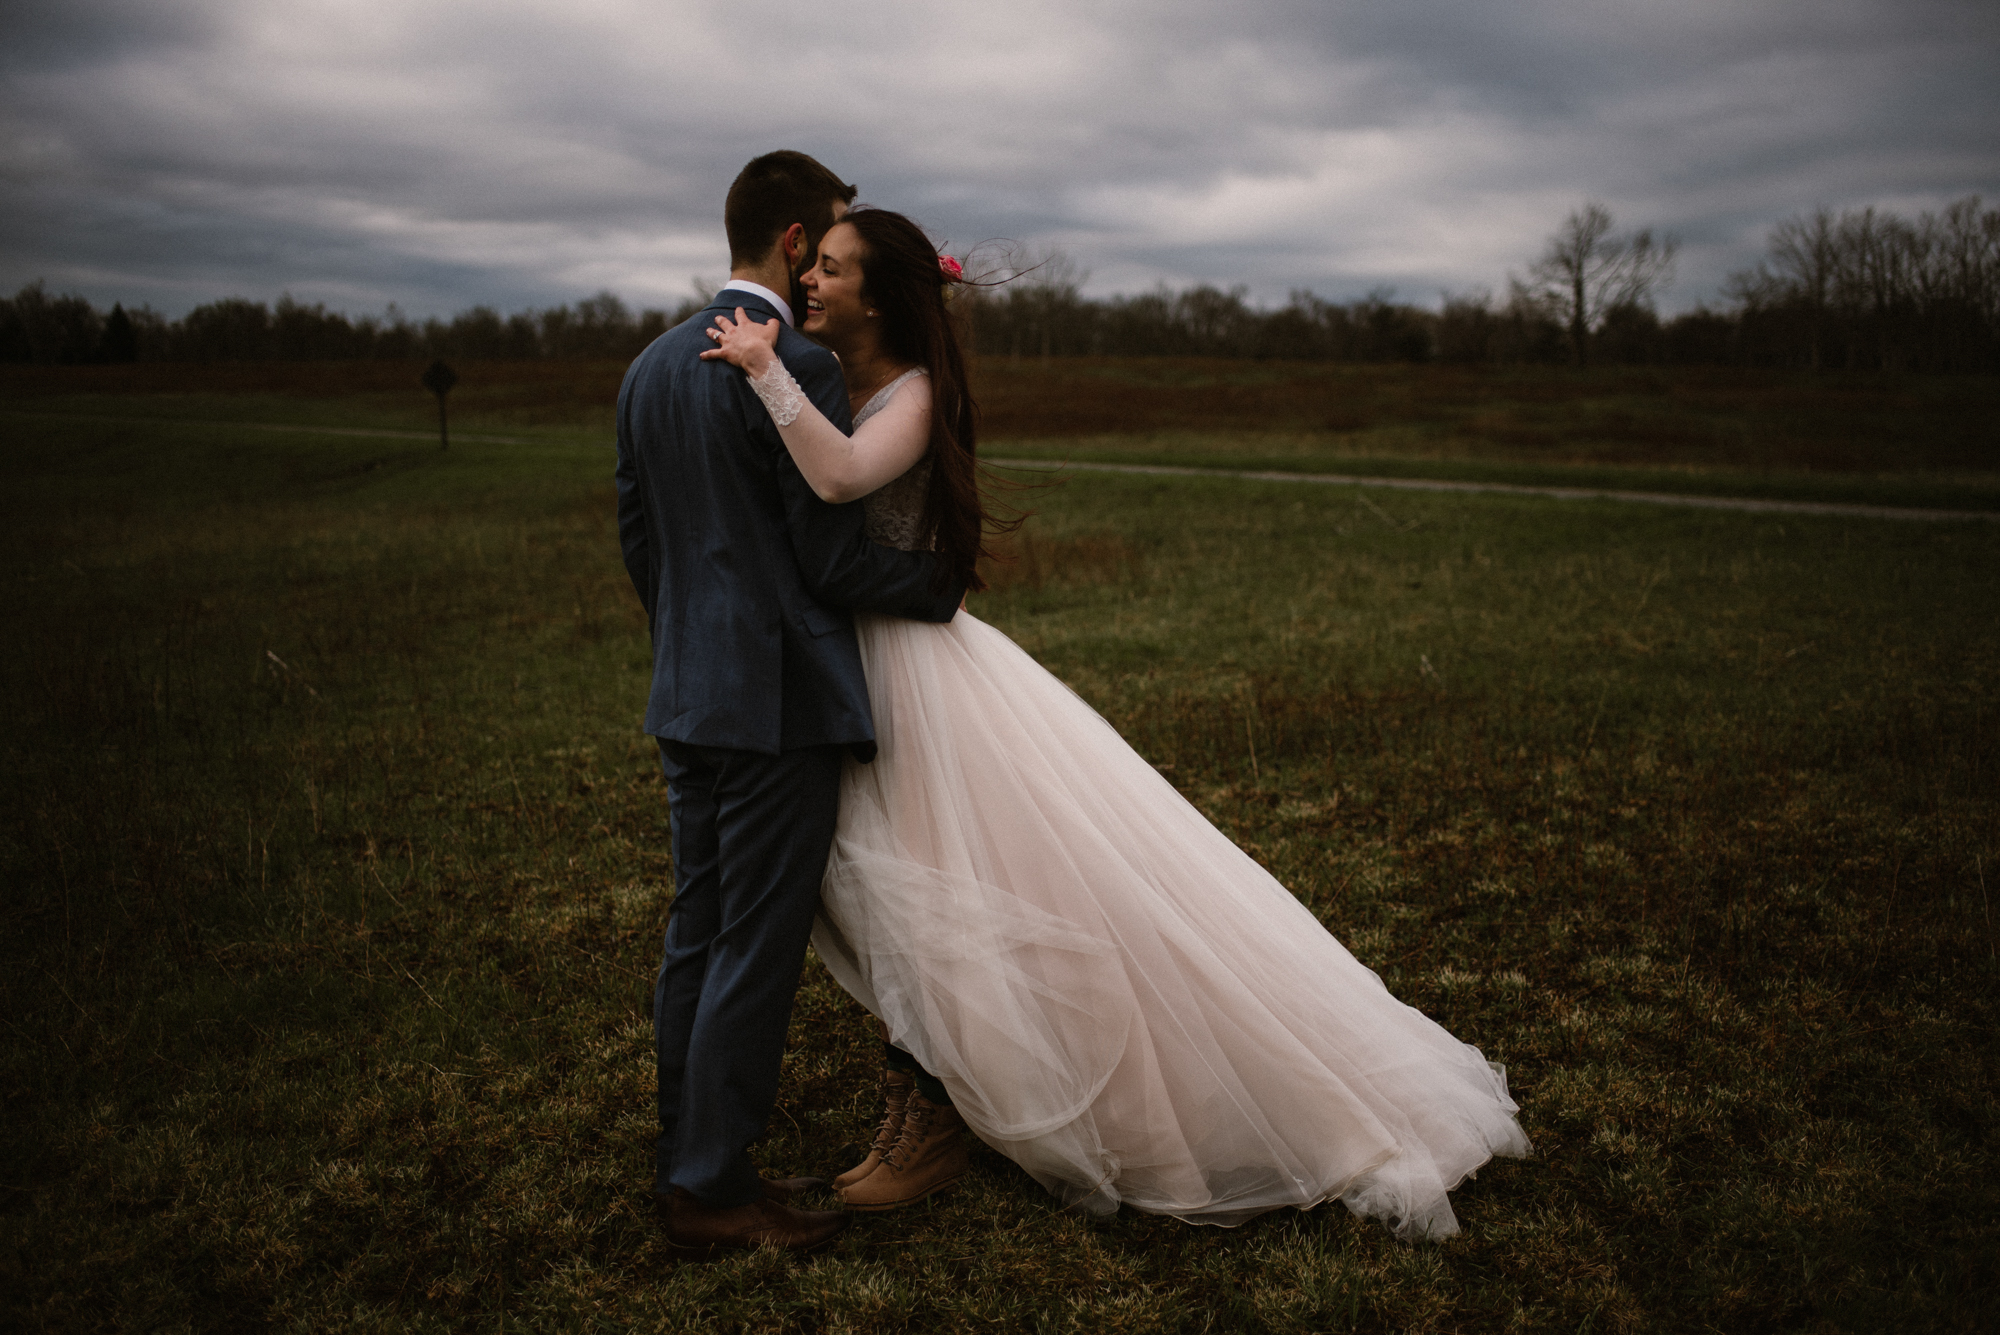 Paula and Andrew - Small Adventurous Wedding in Shenandoah National Park - Blue Ridge Mountain Wedding - White Sails Creative - Mountain Elopement_36.jpg